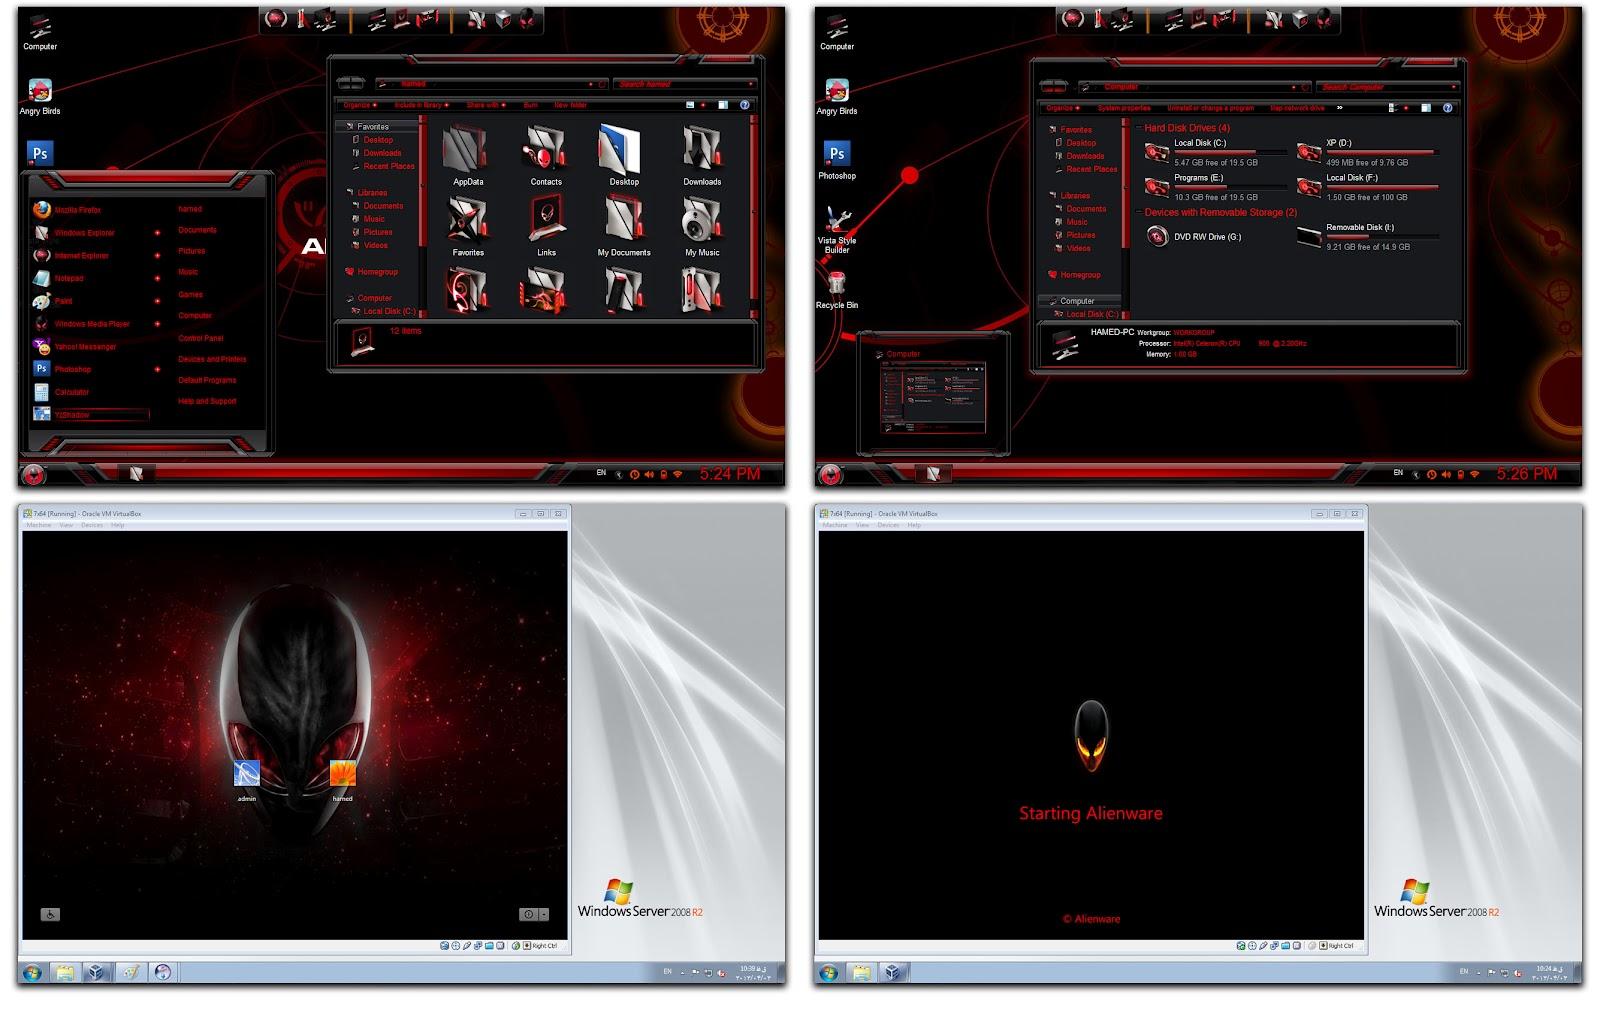 http://4.bp.blogspot.com/-Pe7dP5FGlOM/UABMkPVxd4I/AAAAAAAAAbk/Lt_cPVqgUzo/s1600/red_alienware_skin_pack_2_0_x86_by_hameddanger-d4omq89.jpg